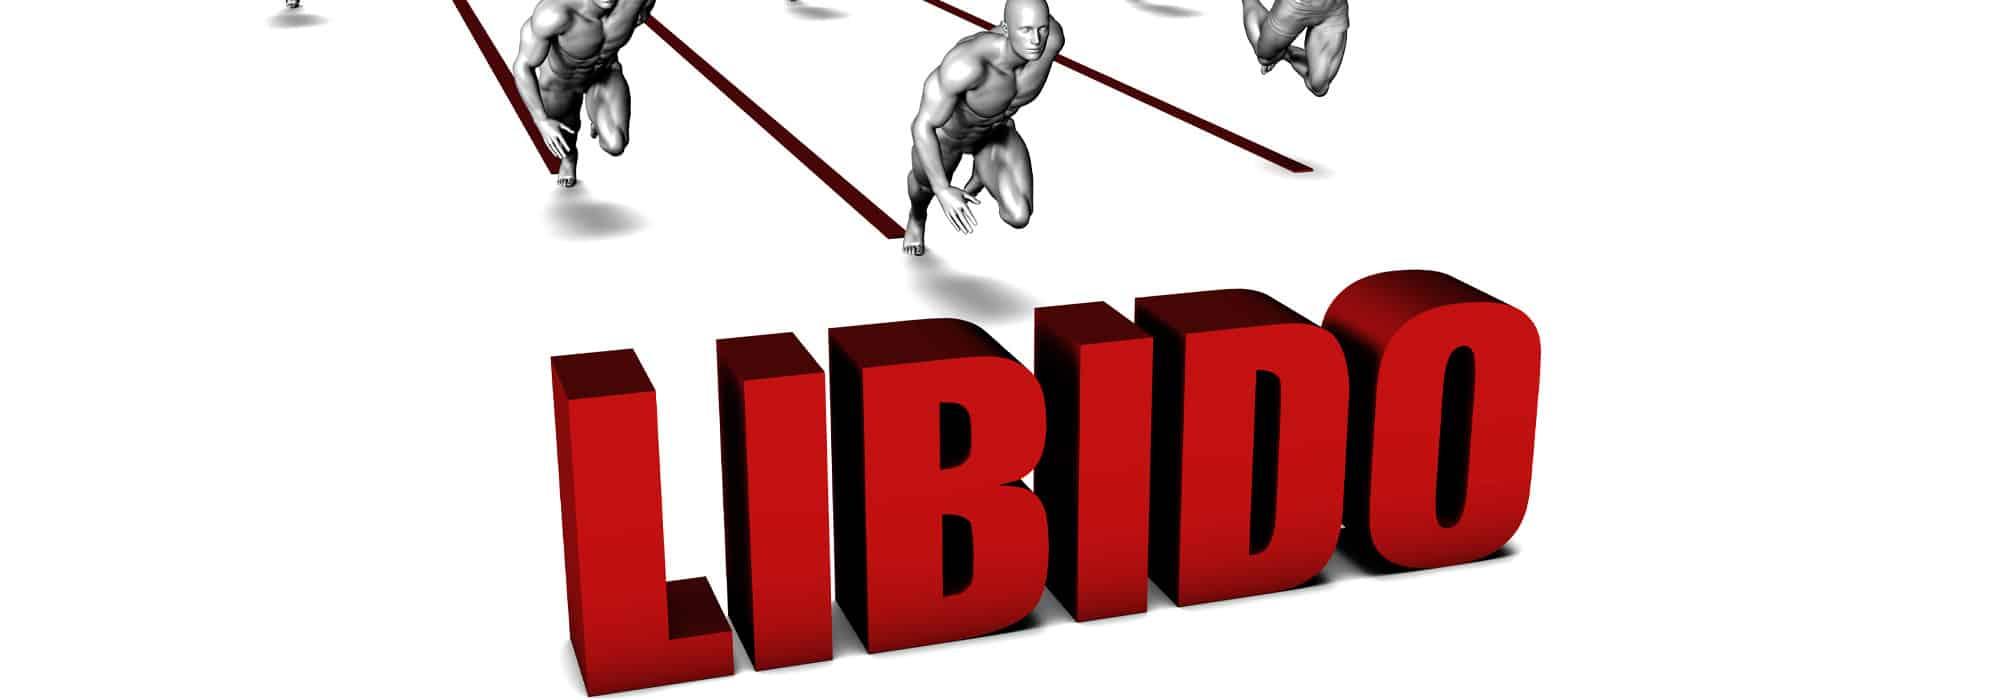 11 Causes of Low Libido in Men